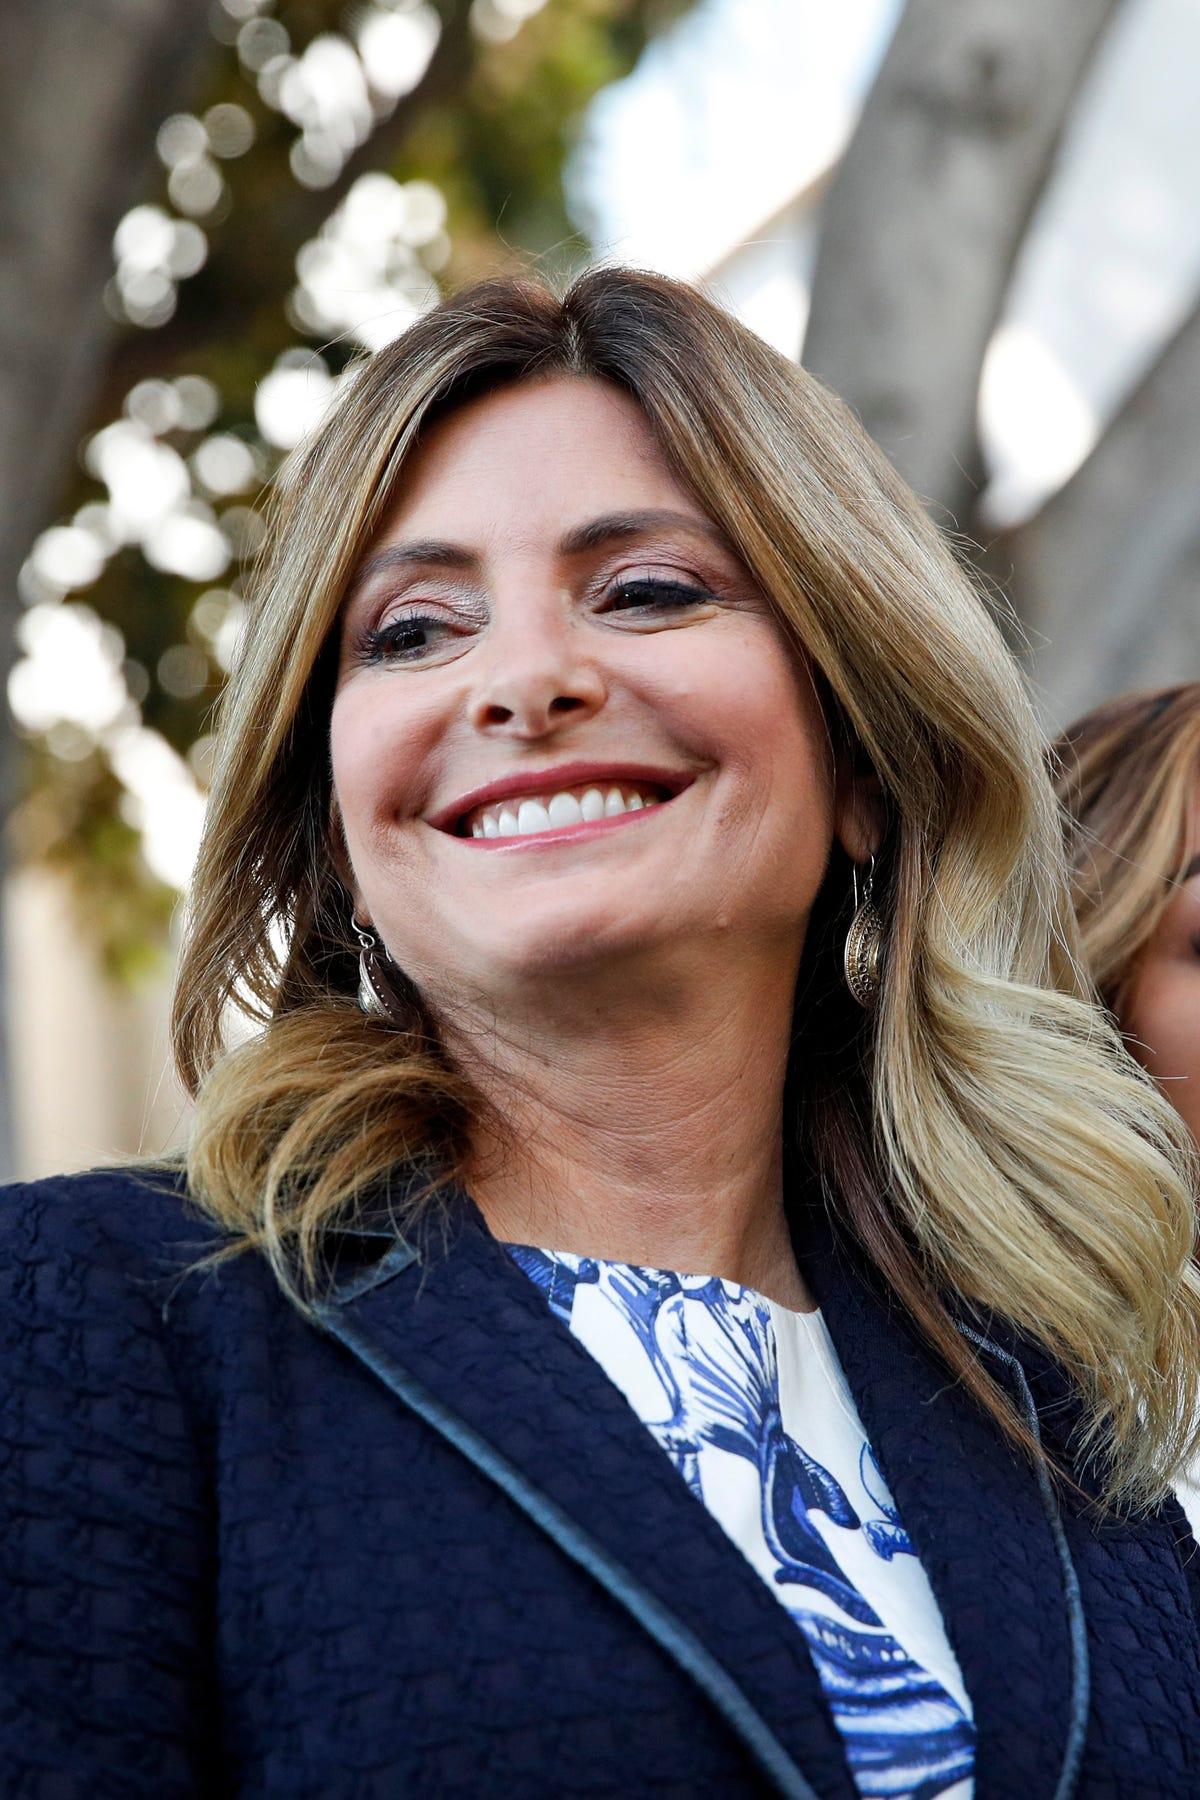 Sheikha Latifa: Lisa Bloom calls for case of 'captive' princess to